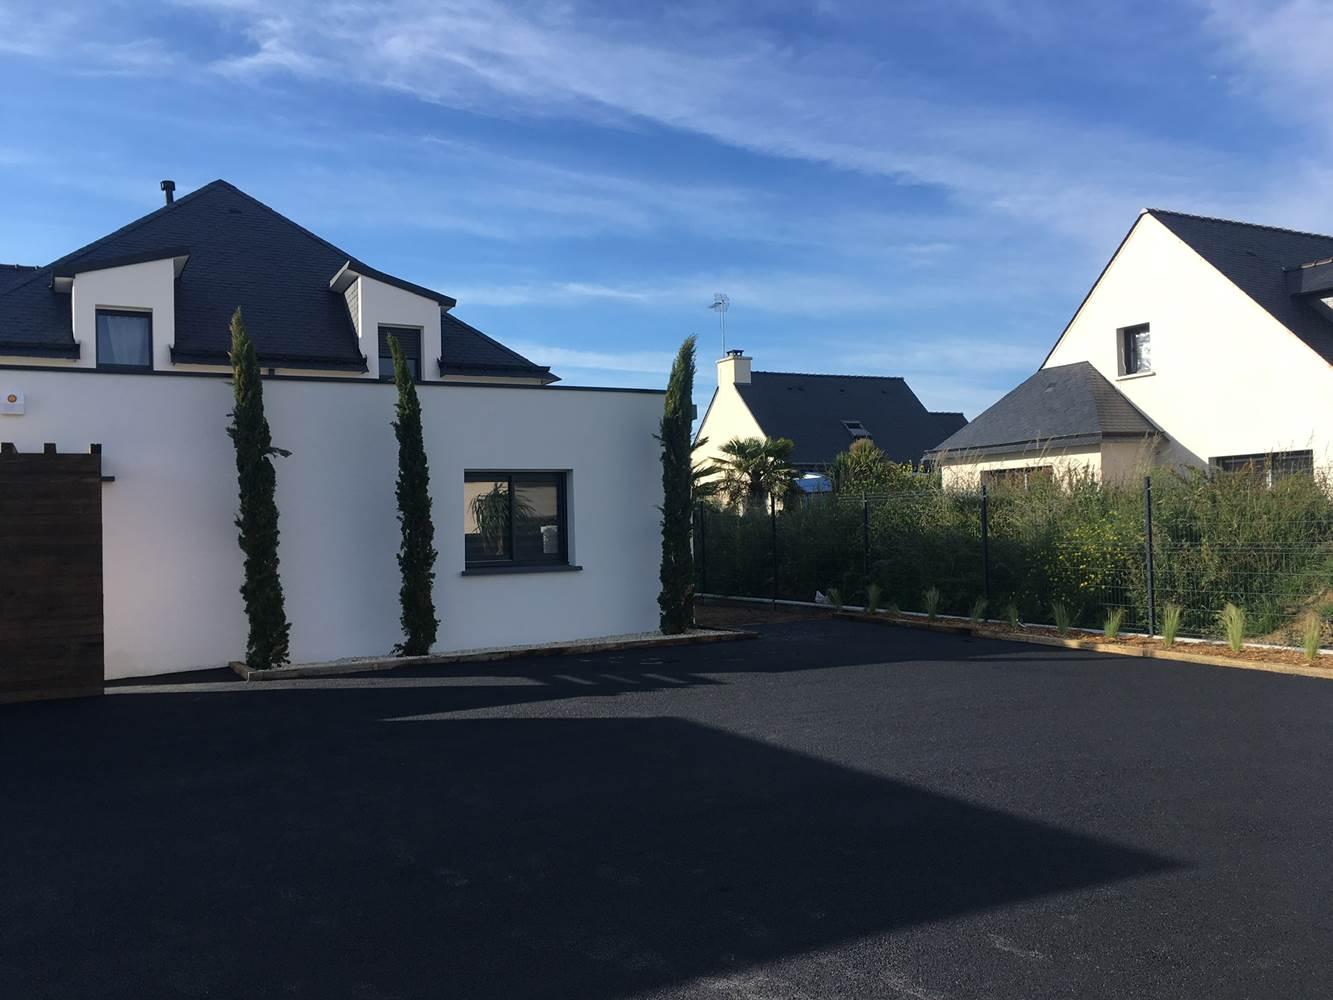 villa charles & ashton parking ©